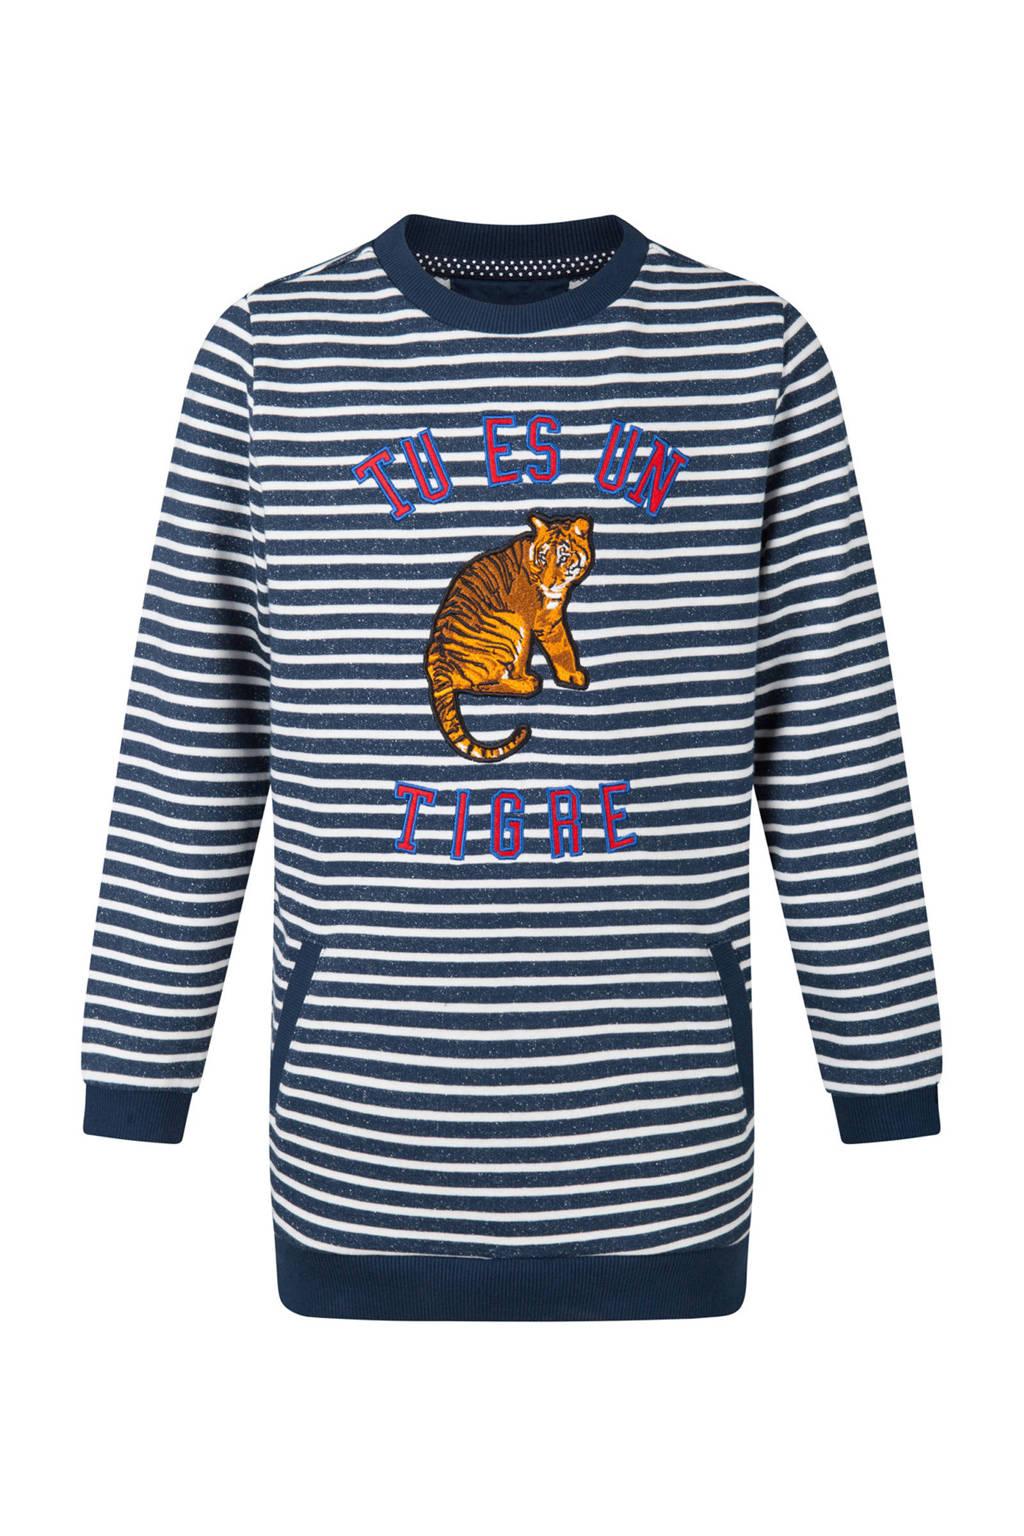 WE Fashion gestreepte glitter jurk met tijger en tekst blauw, Donkerblauw/wit